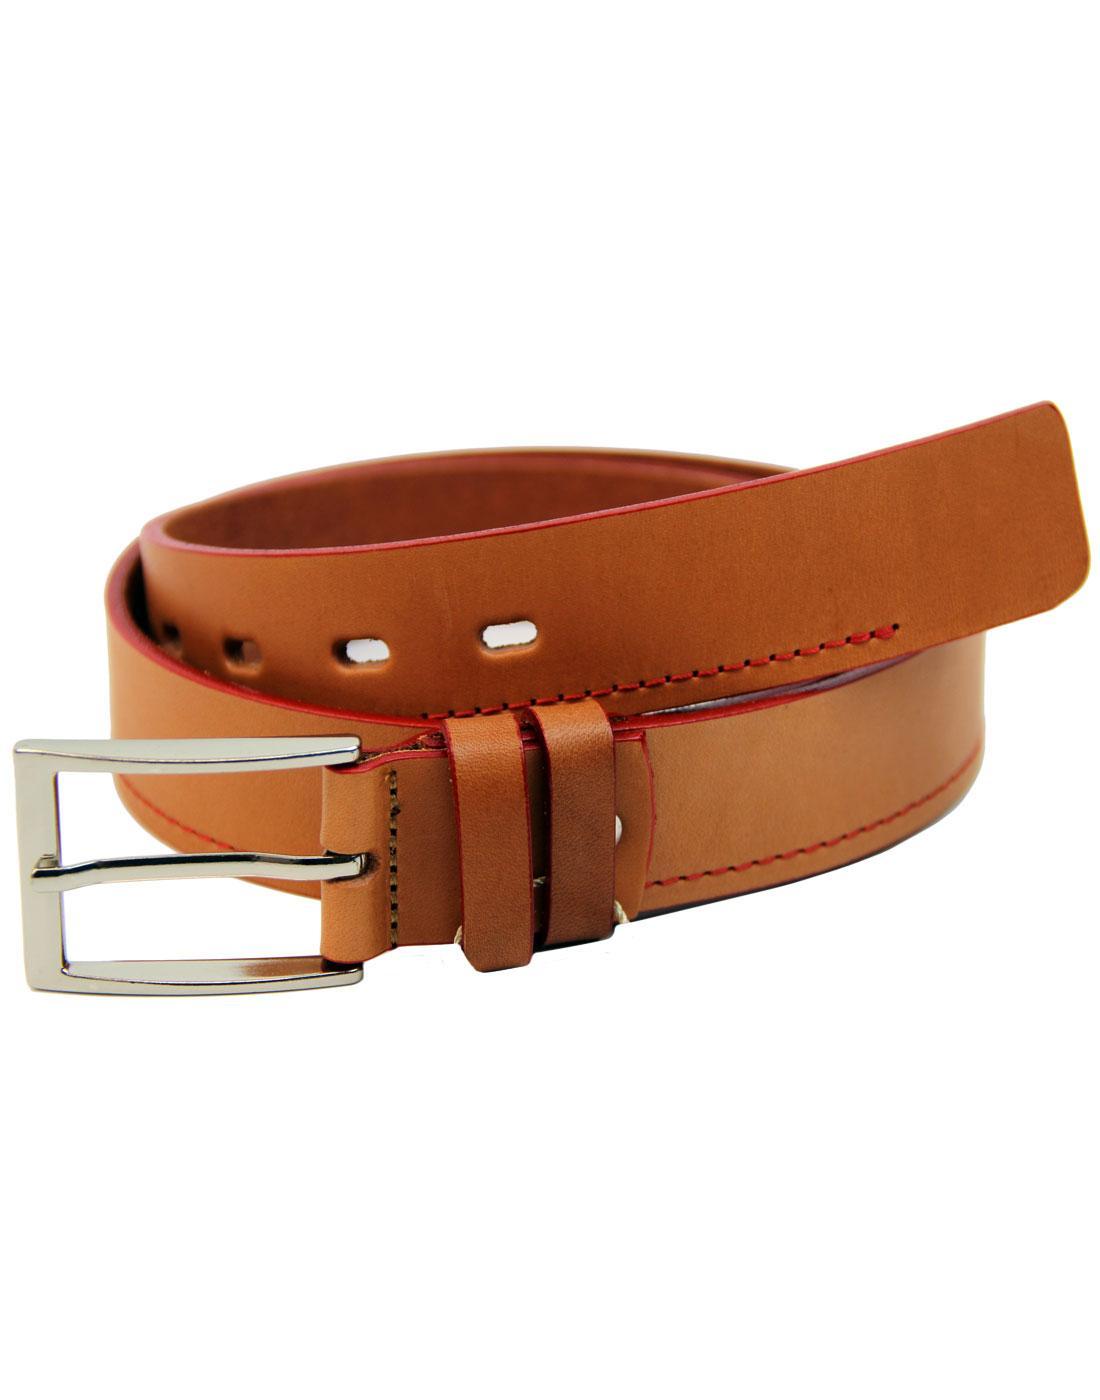 LACUZZO Retro Mod Red Stitch Leather Belt COGNAC